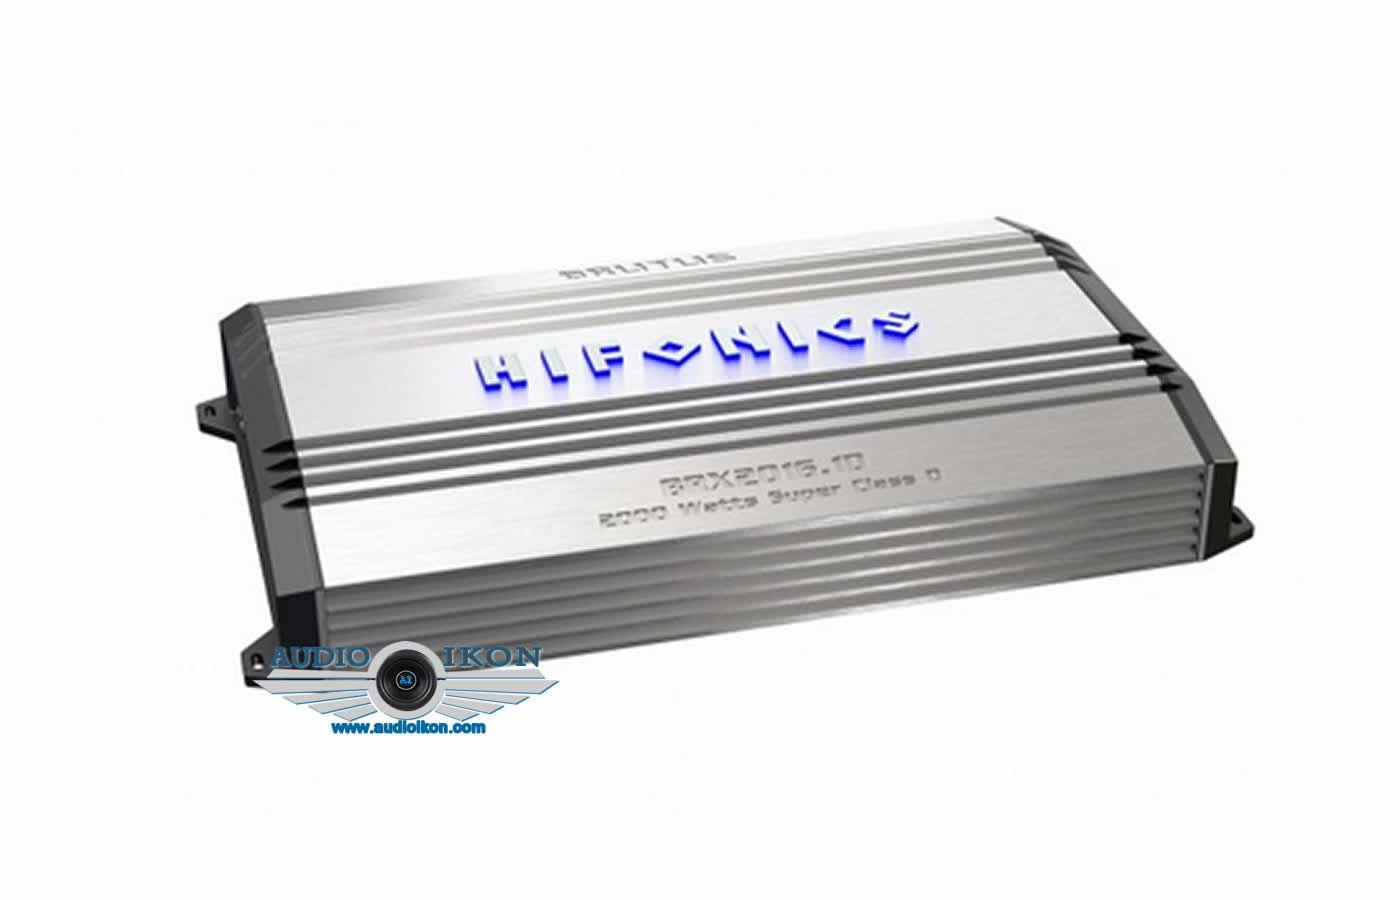 Hifonics Brutus Brx2016 1d 1ch Hifonics Car Amplifier Car Amp